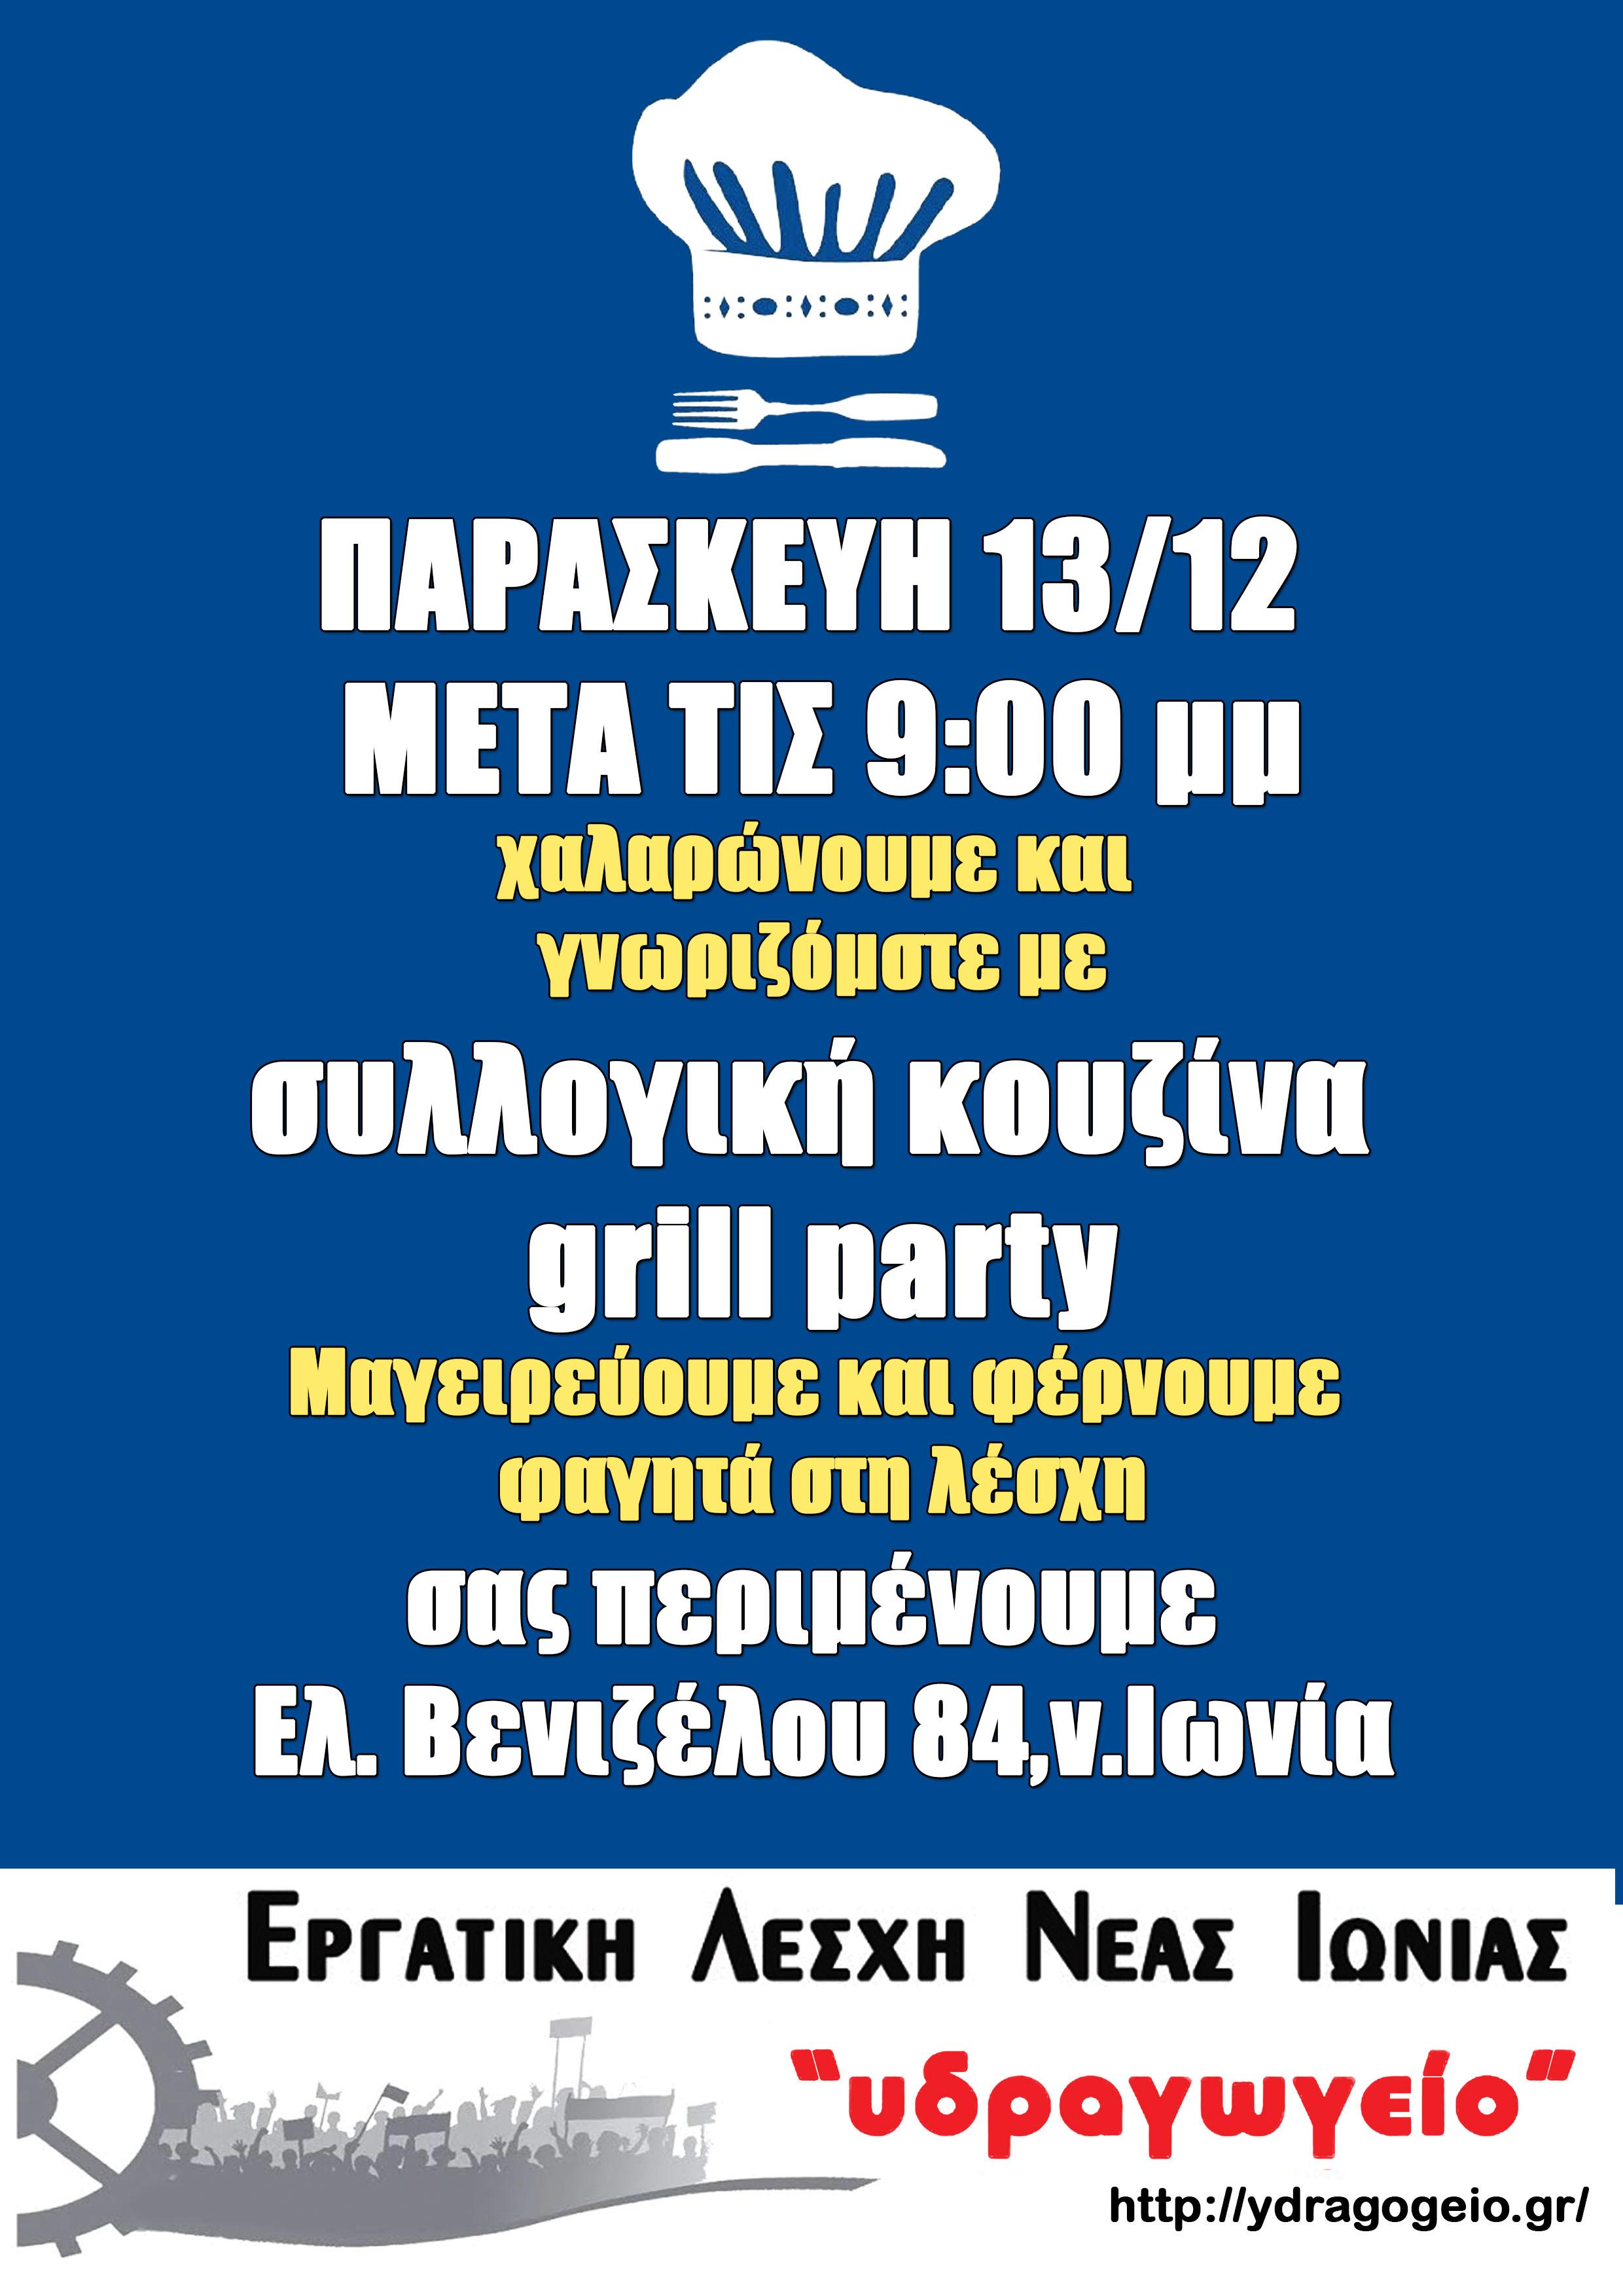 GRILL PARTY-ΣΥΛΛΟΓΙΚΟ ΦΑΓΟΠΟΤΙ!